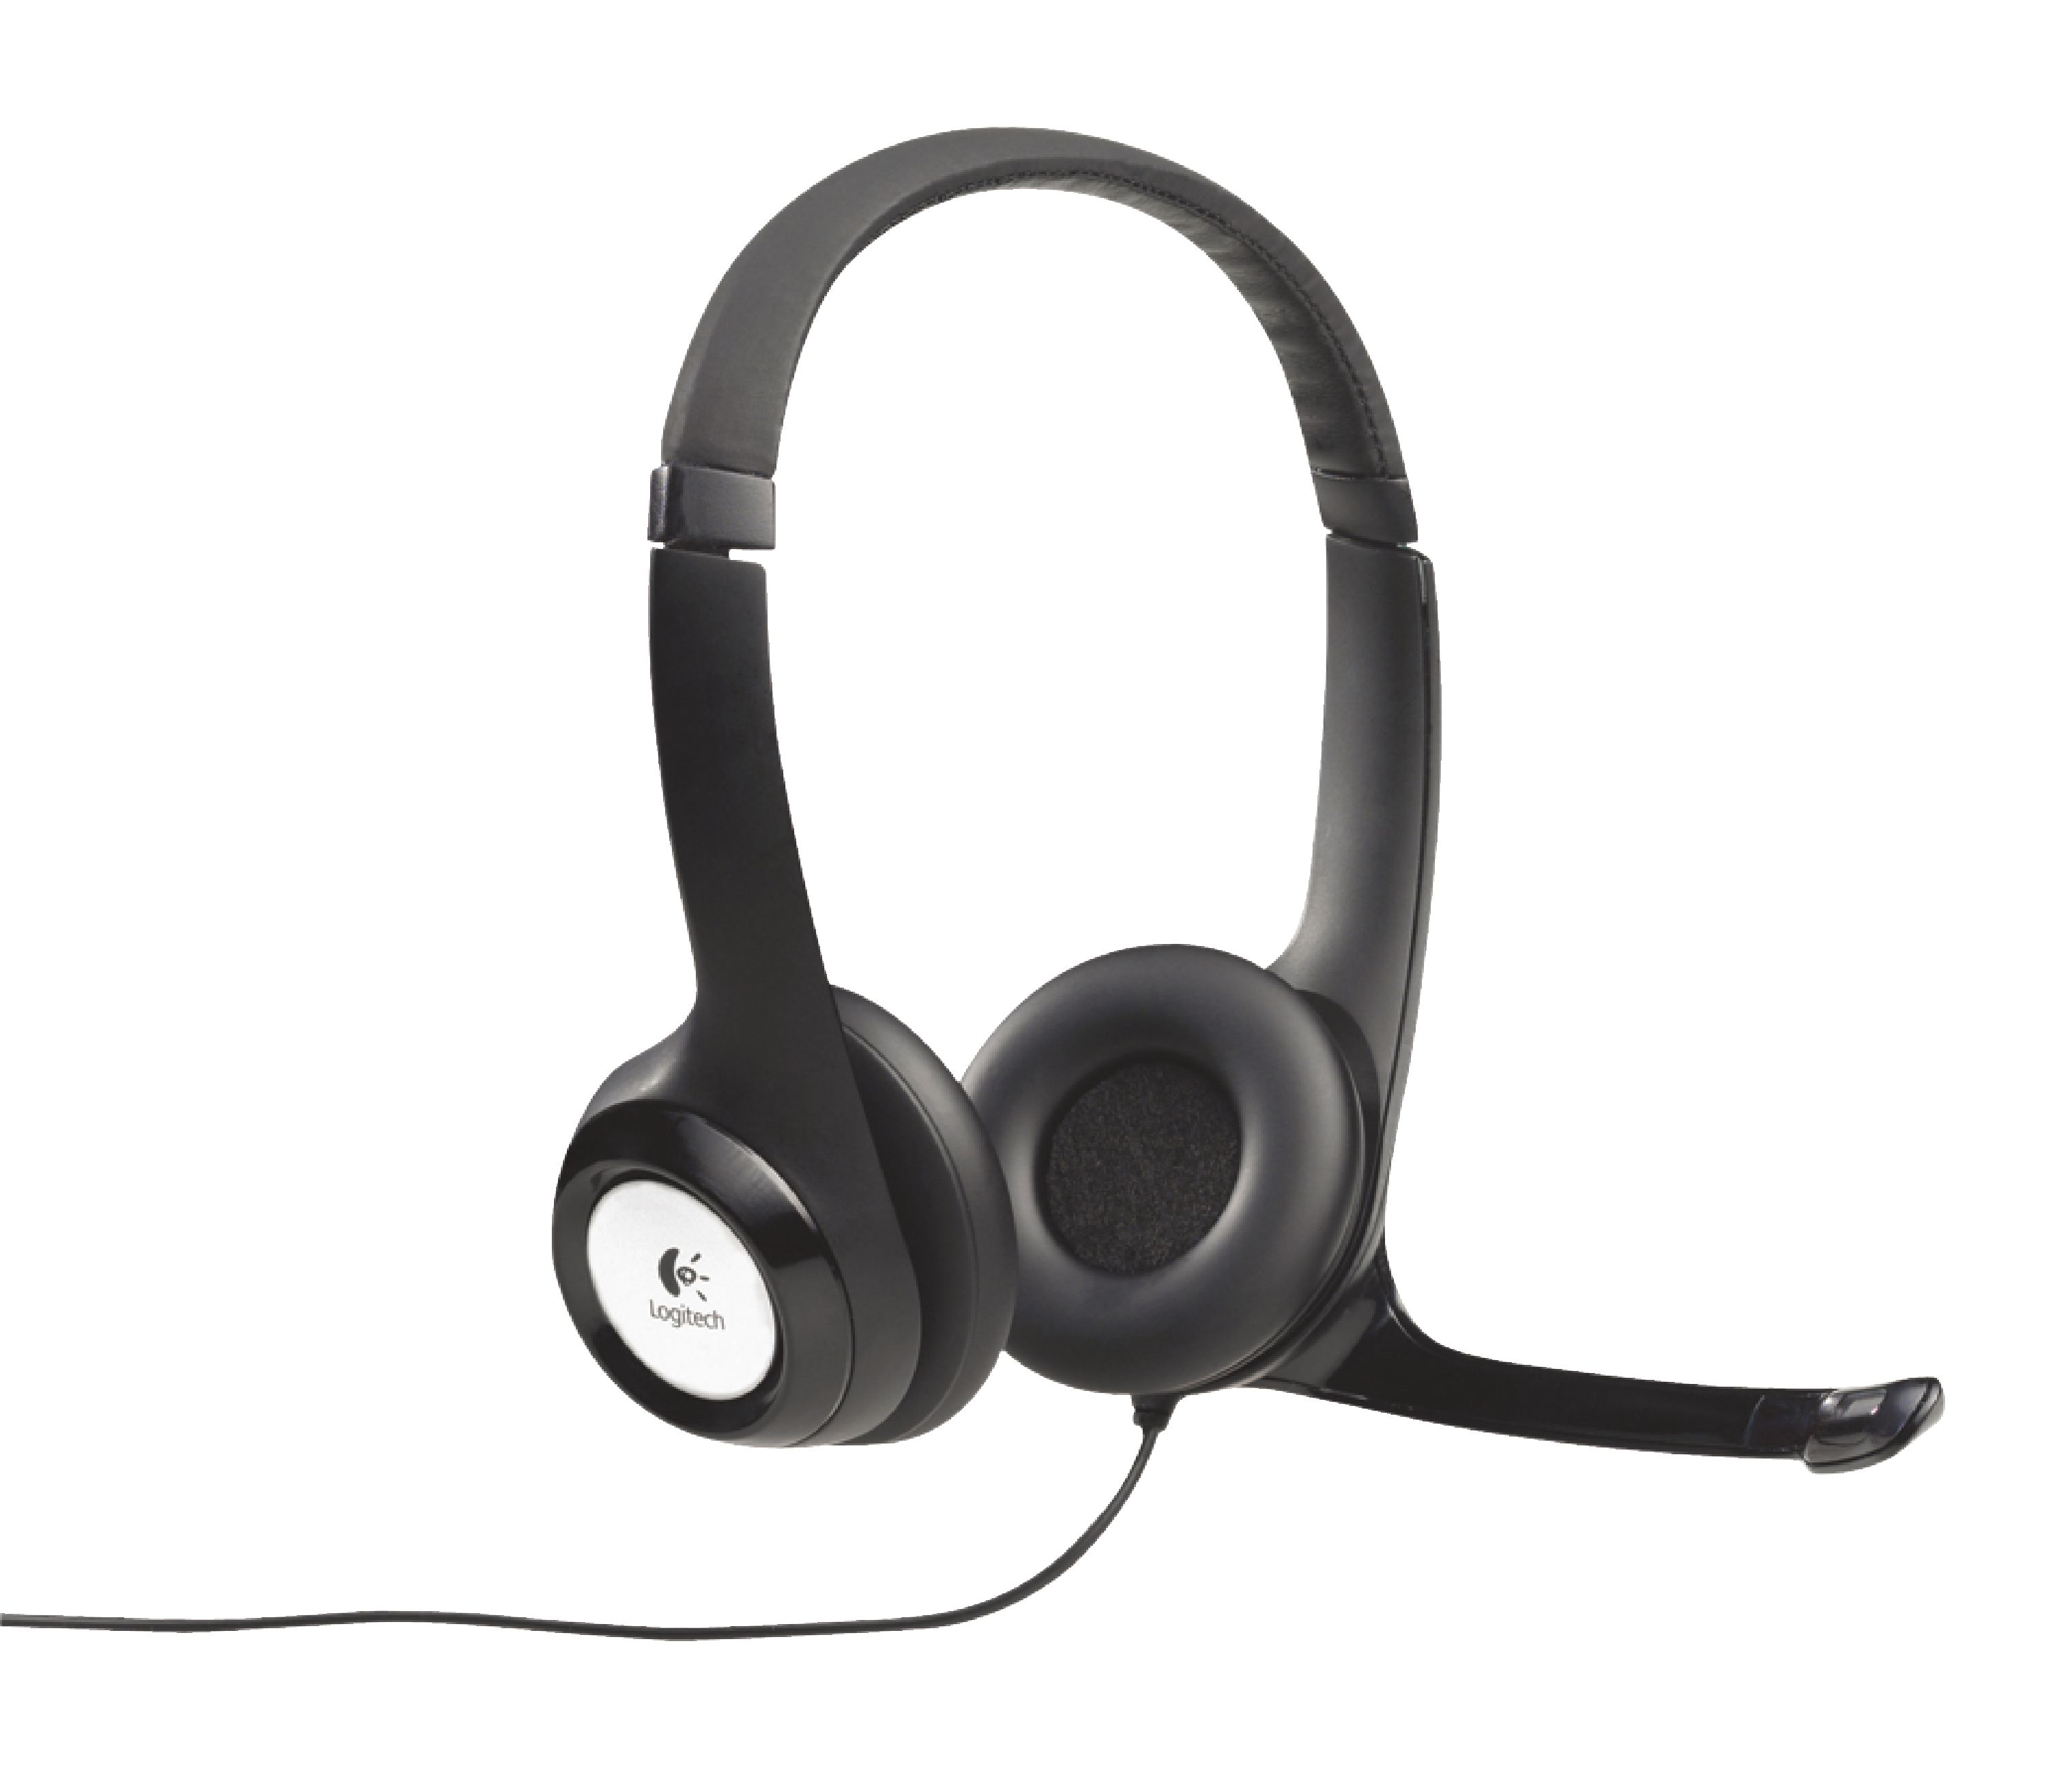 Image of   Headset ANC (Active Noise Cancelling) On-Ear USB Kabel Indbygget Mikrofon 2.4 m Sort